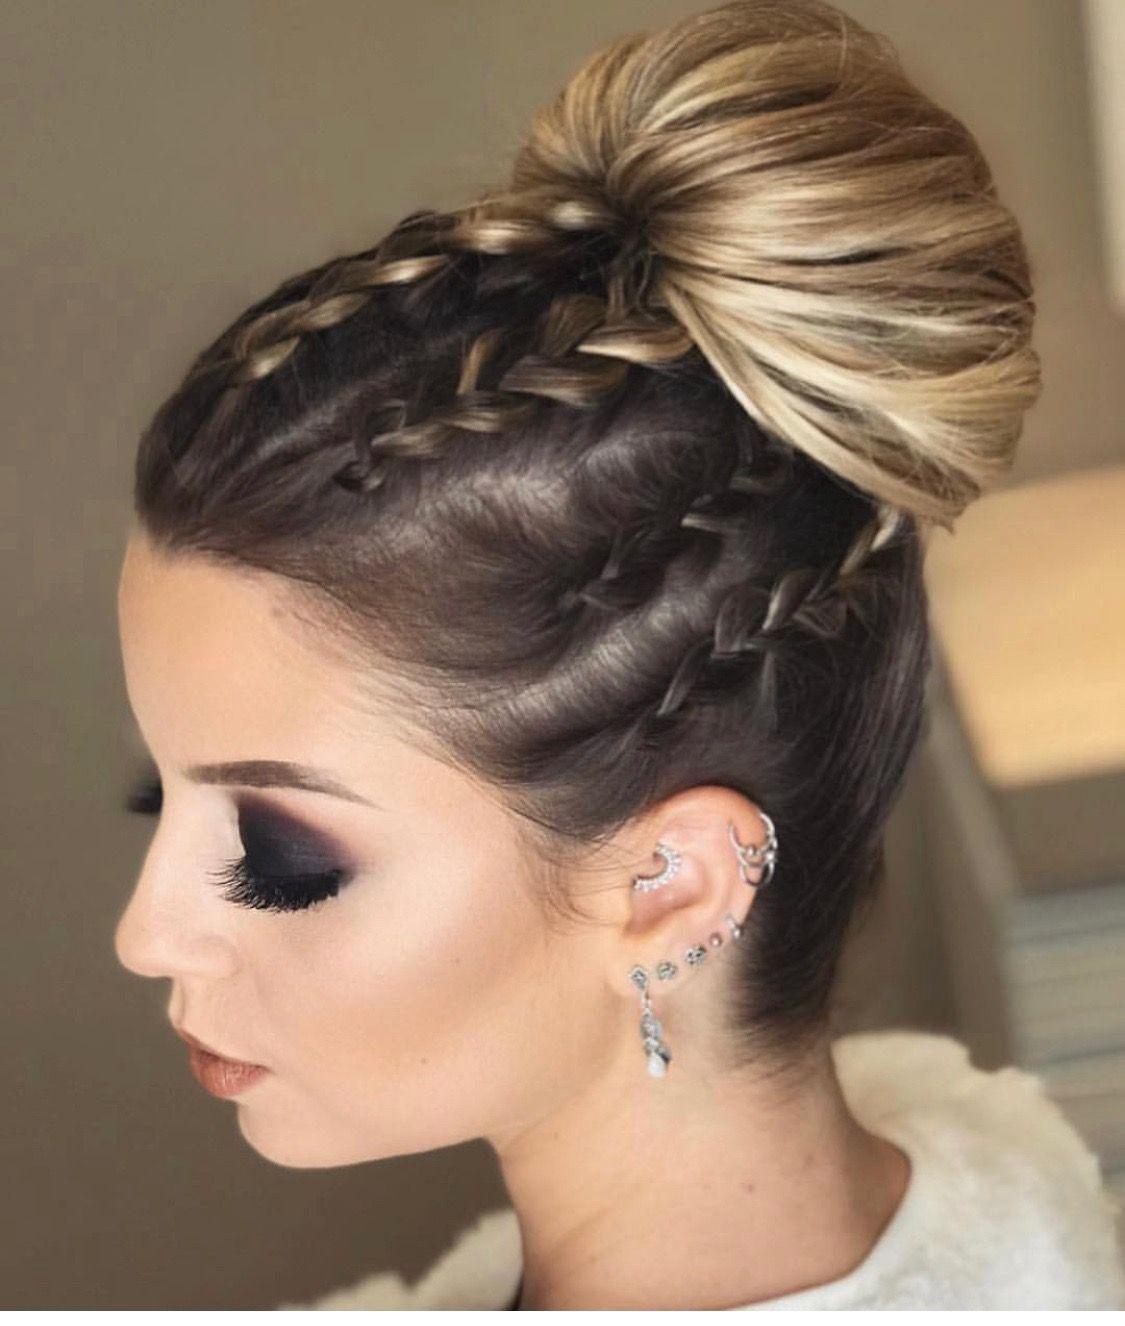 Peinado Peinados Con Trenzas Pelo Corto Peinados Con Pelo Recogido Peinados Pelo Largo